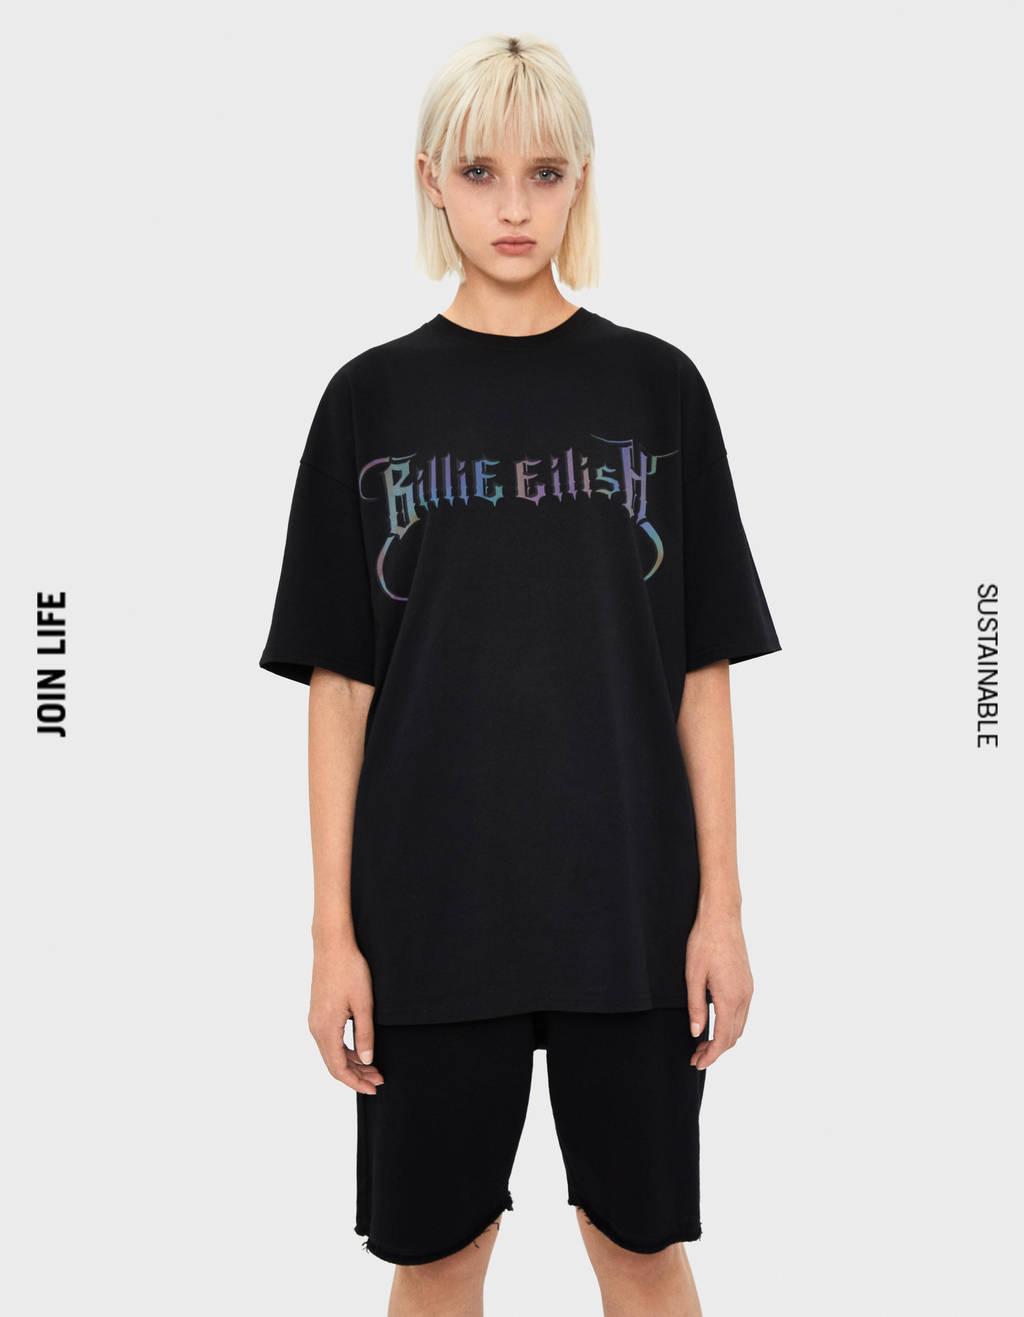 Billie Eilish x Bershka t-shirt med reflex